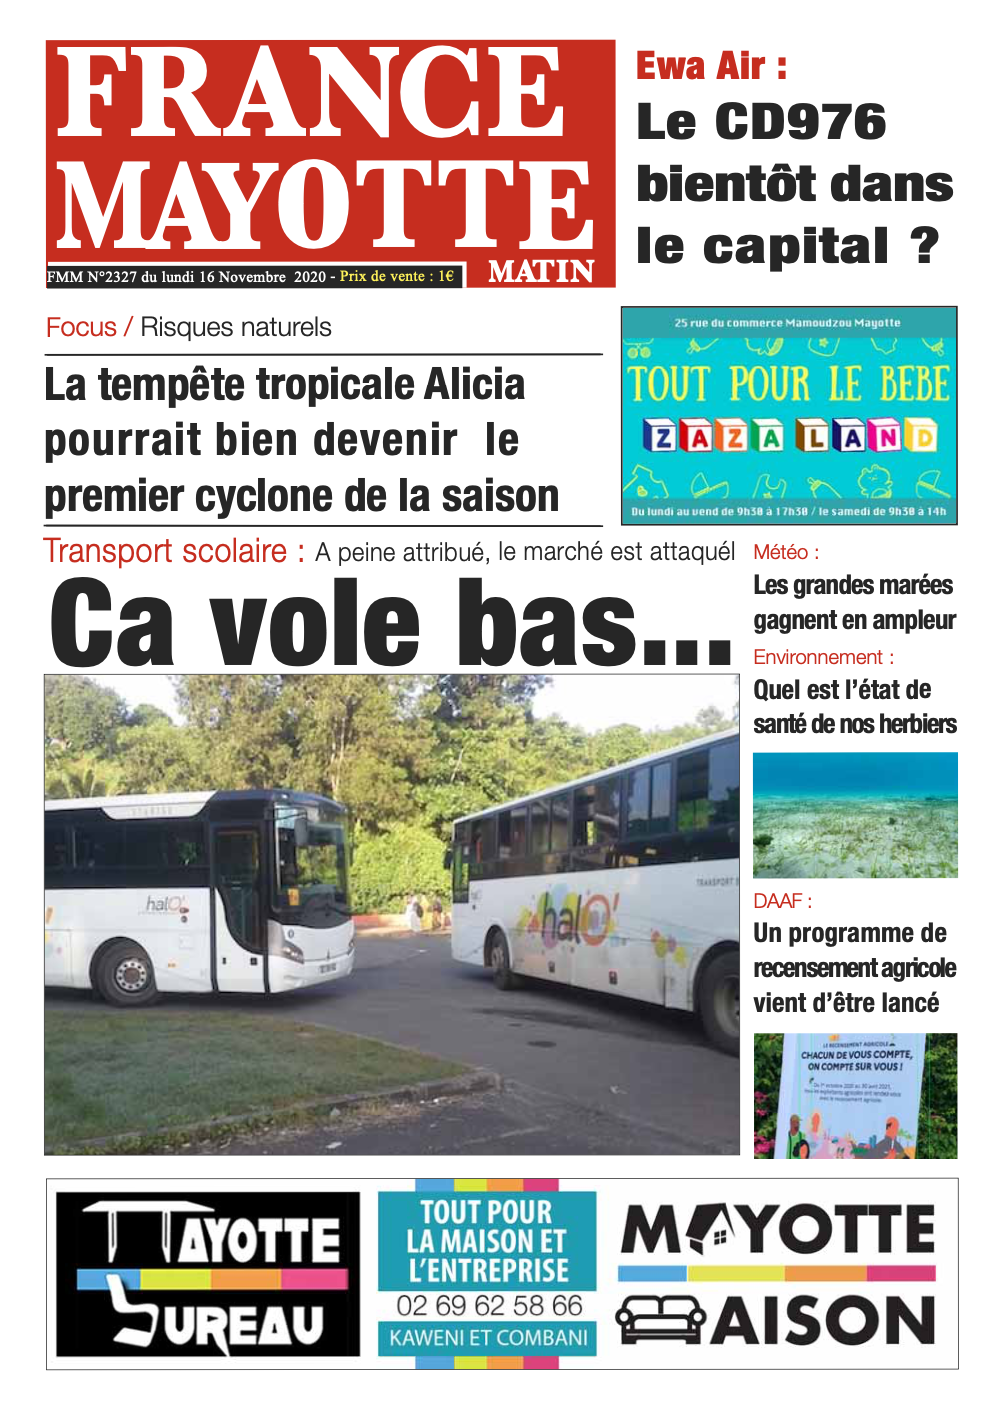 France Mayotte Lundi 16 novembre 2020